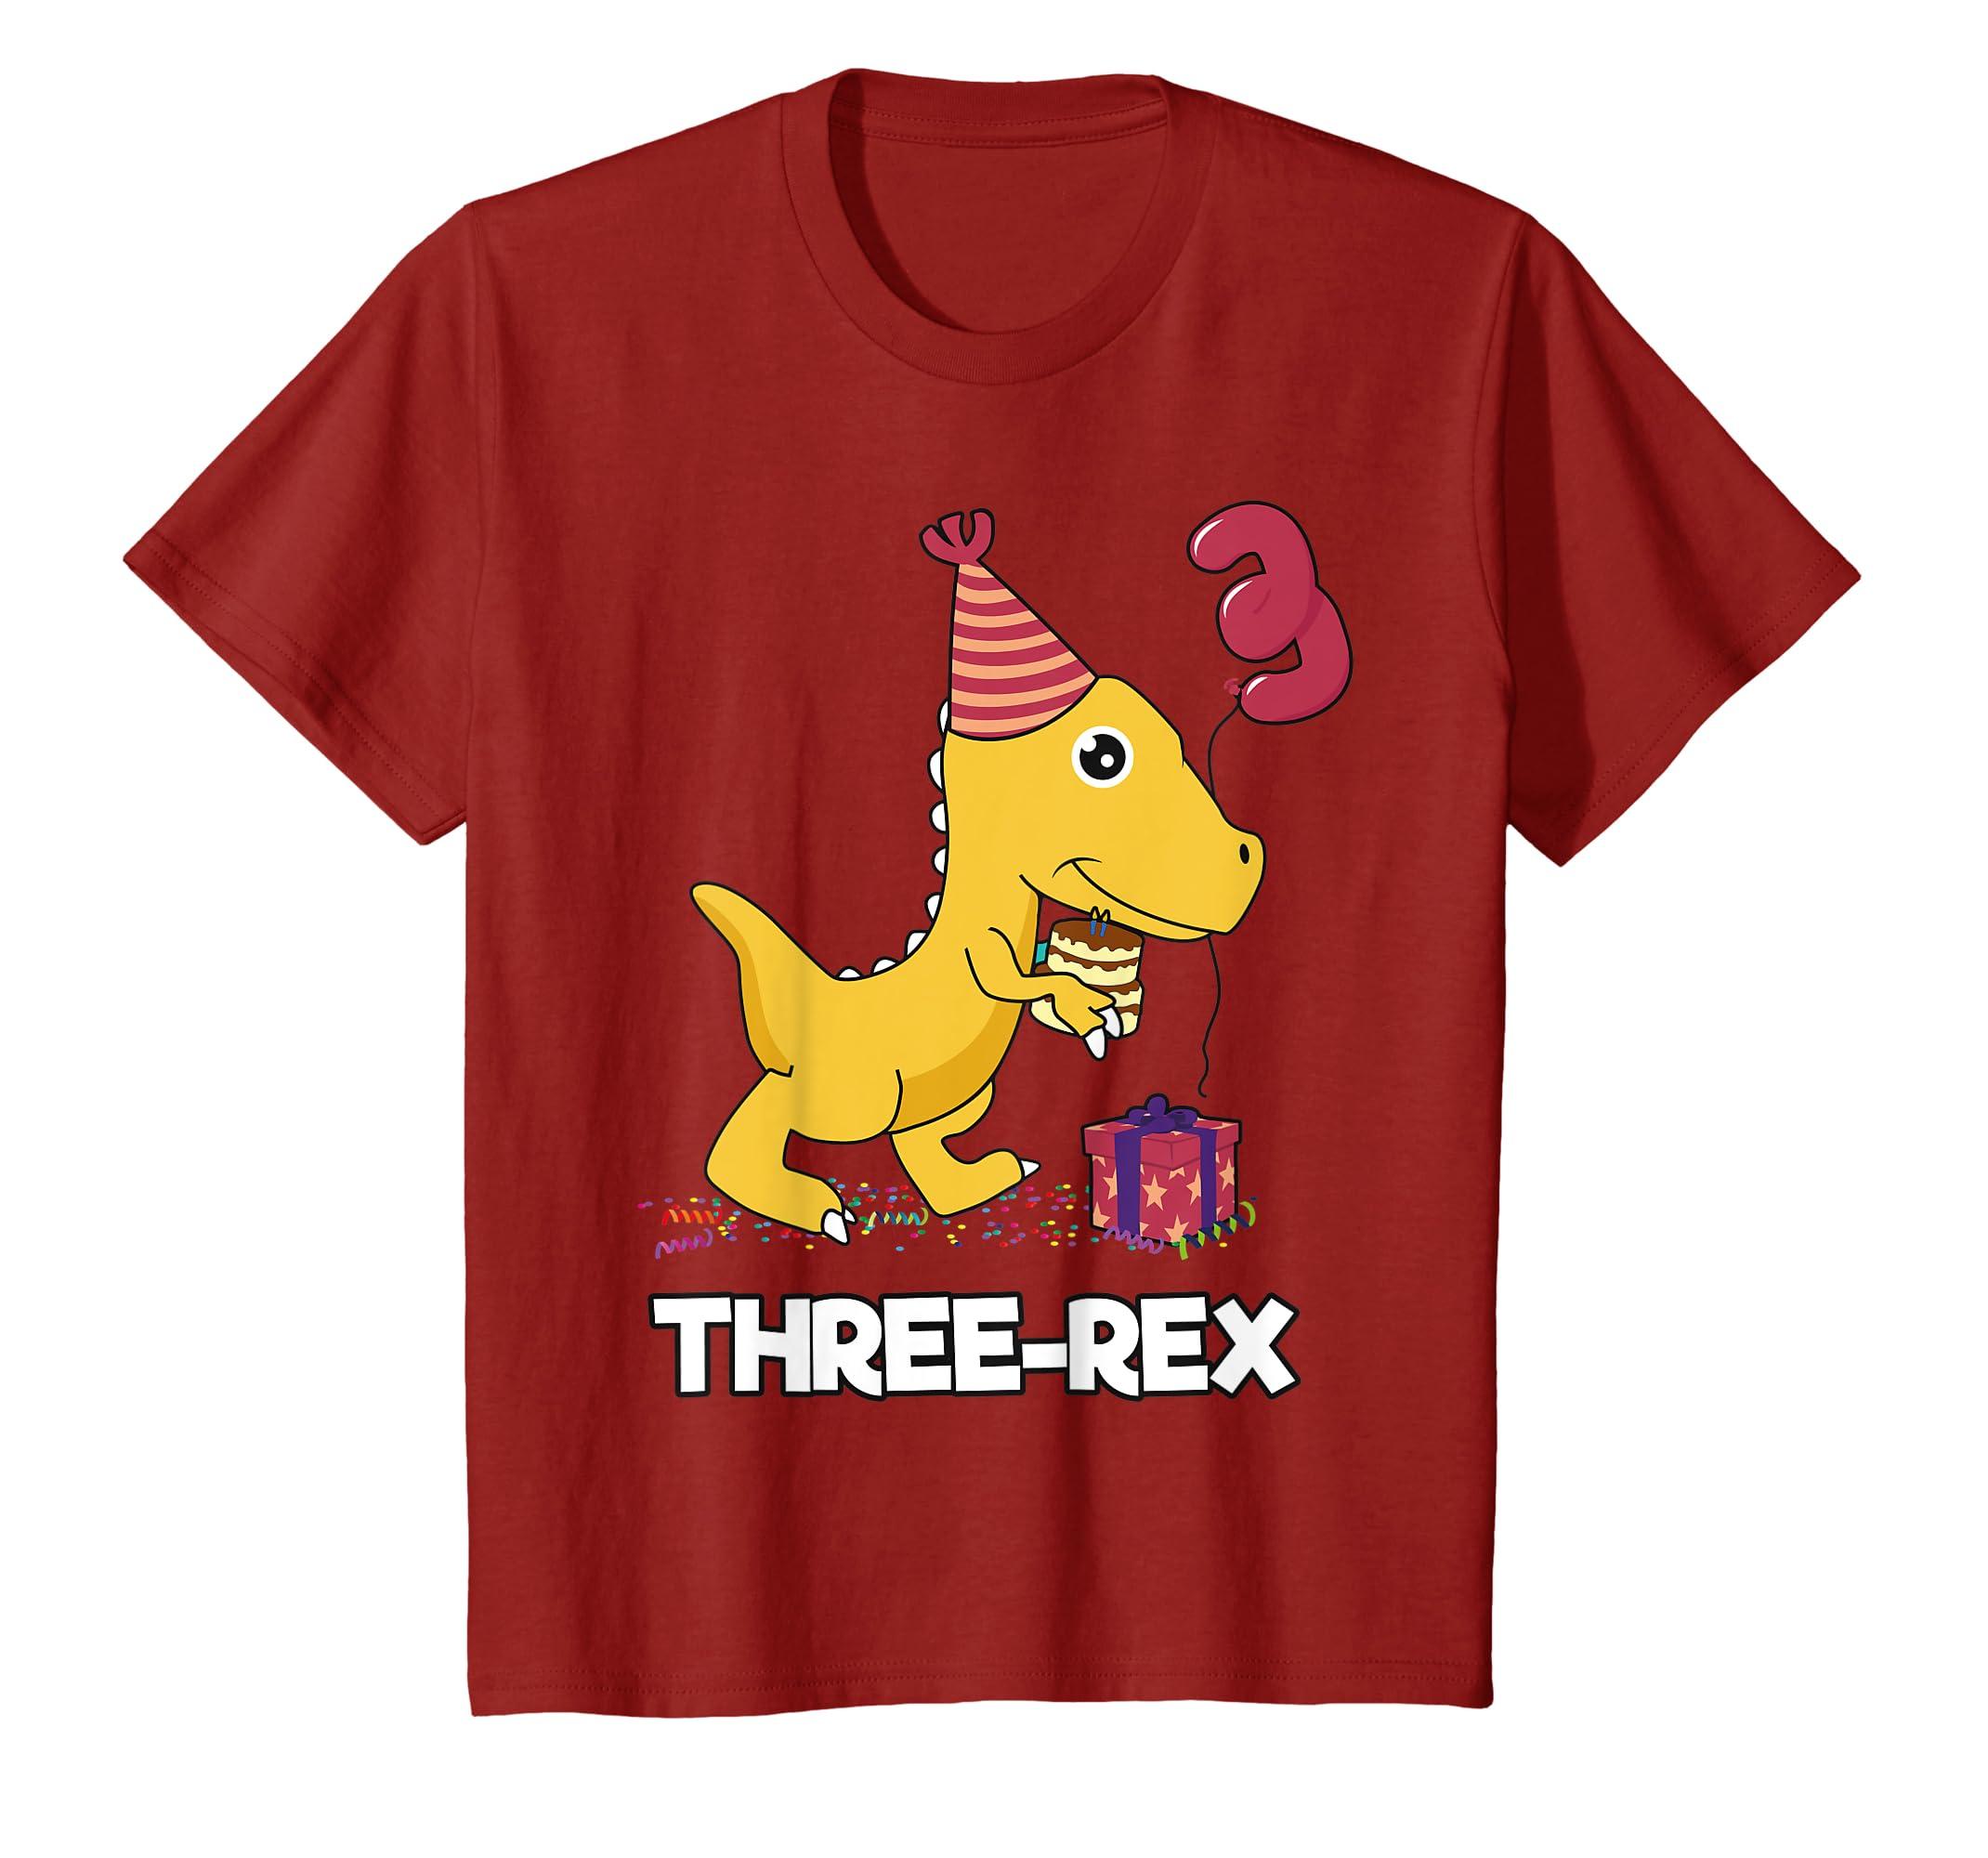 Amazon Kids 3 Year Old Birthday Gift Boy Shirt Dinosaur Three Rex Clothing